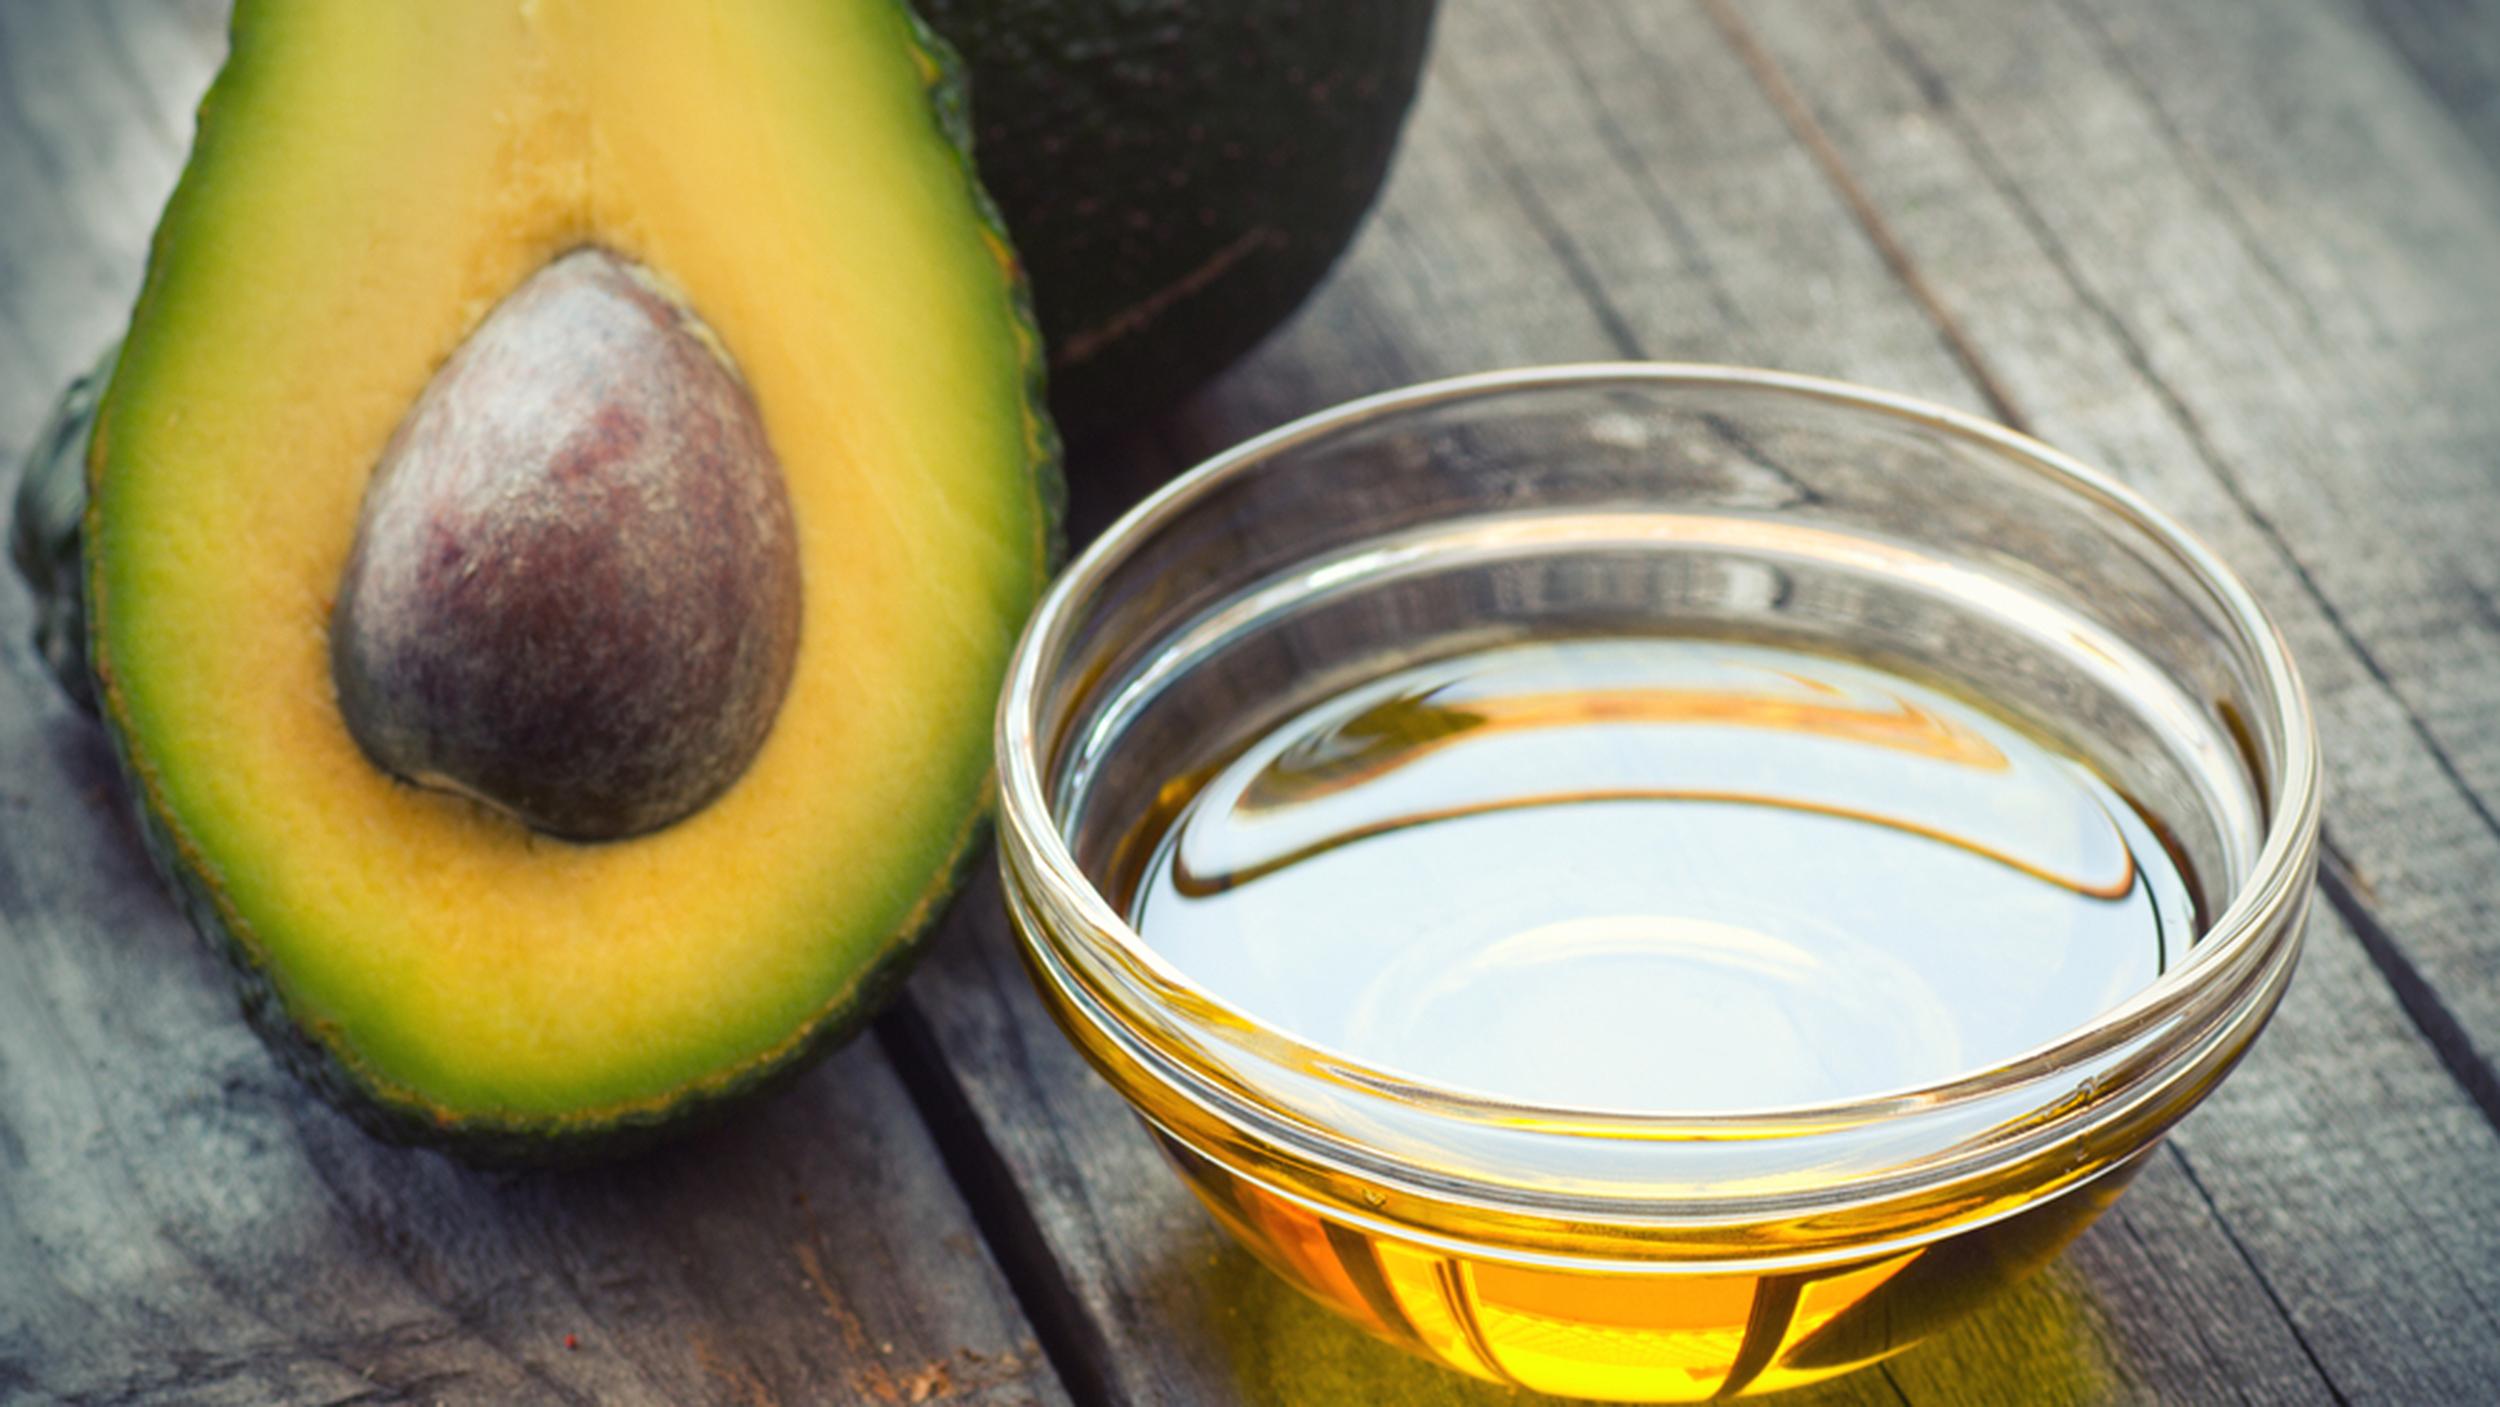 avocado-oil-today-160107-tease_5546f12e90461f968f92dc3cf8463be2.jpg